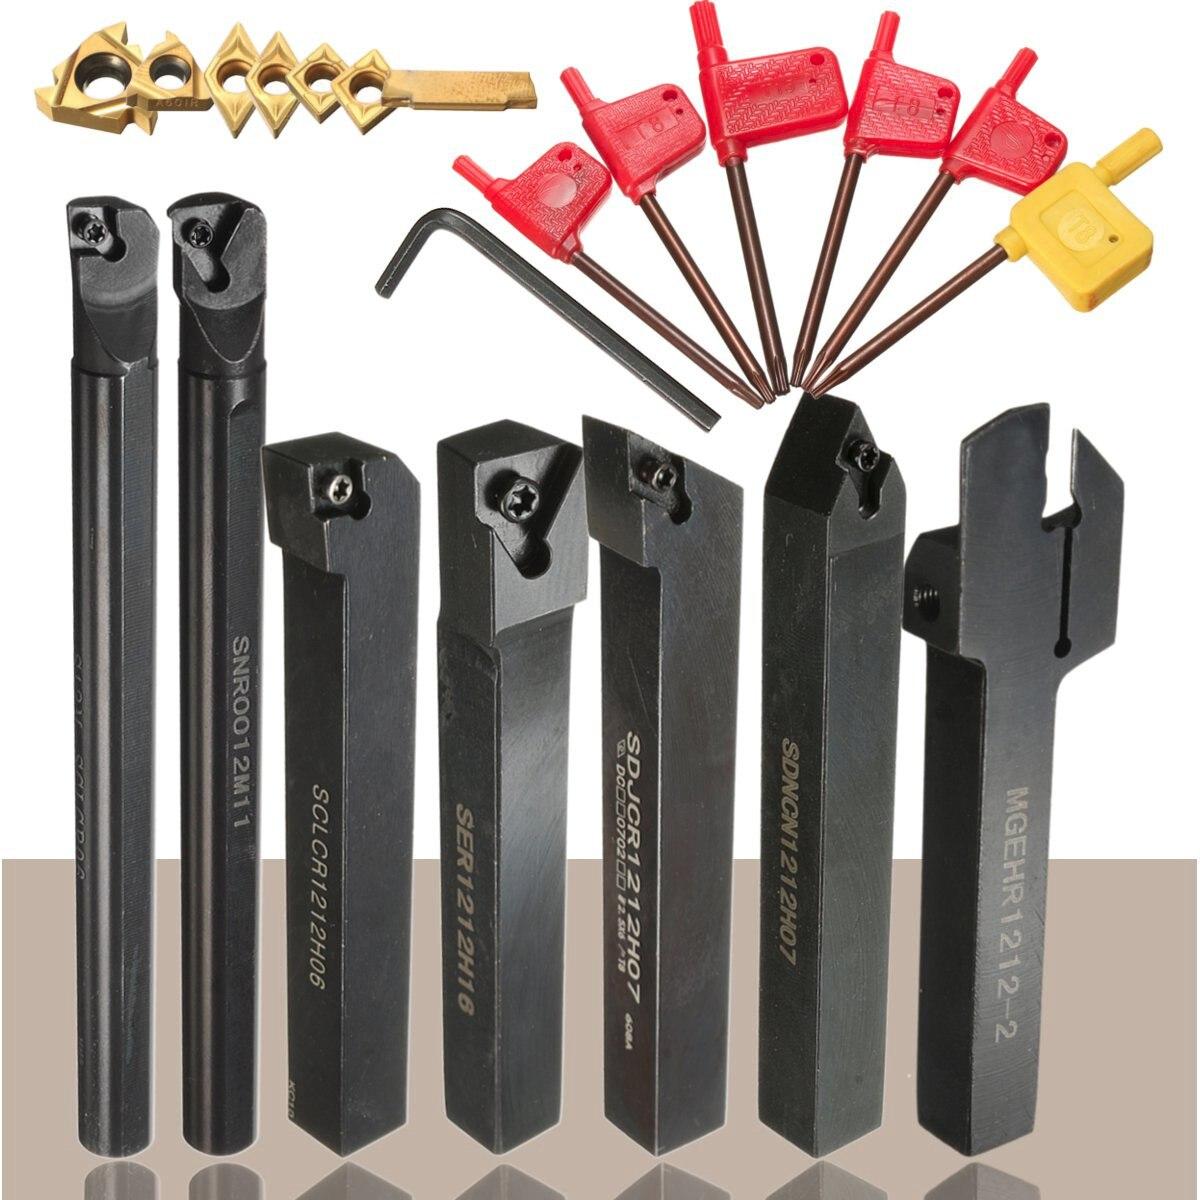 7pcs Turning Tool Holder Set 12mm Shank Lathe Boring Bar With Carbide Inserts + 7pcs Wrenches Tools Set7pcs Turning Tool Holder Set 12mm Shank Lathe Boring Bar With Carbide Inserts + 7pcs Wrenches Tools Set